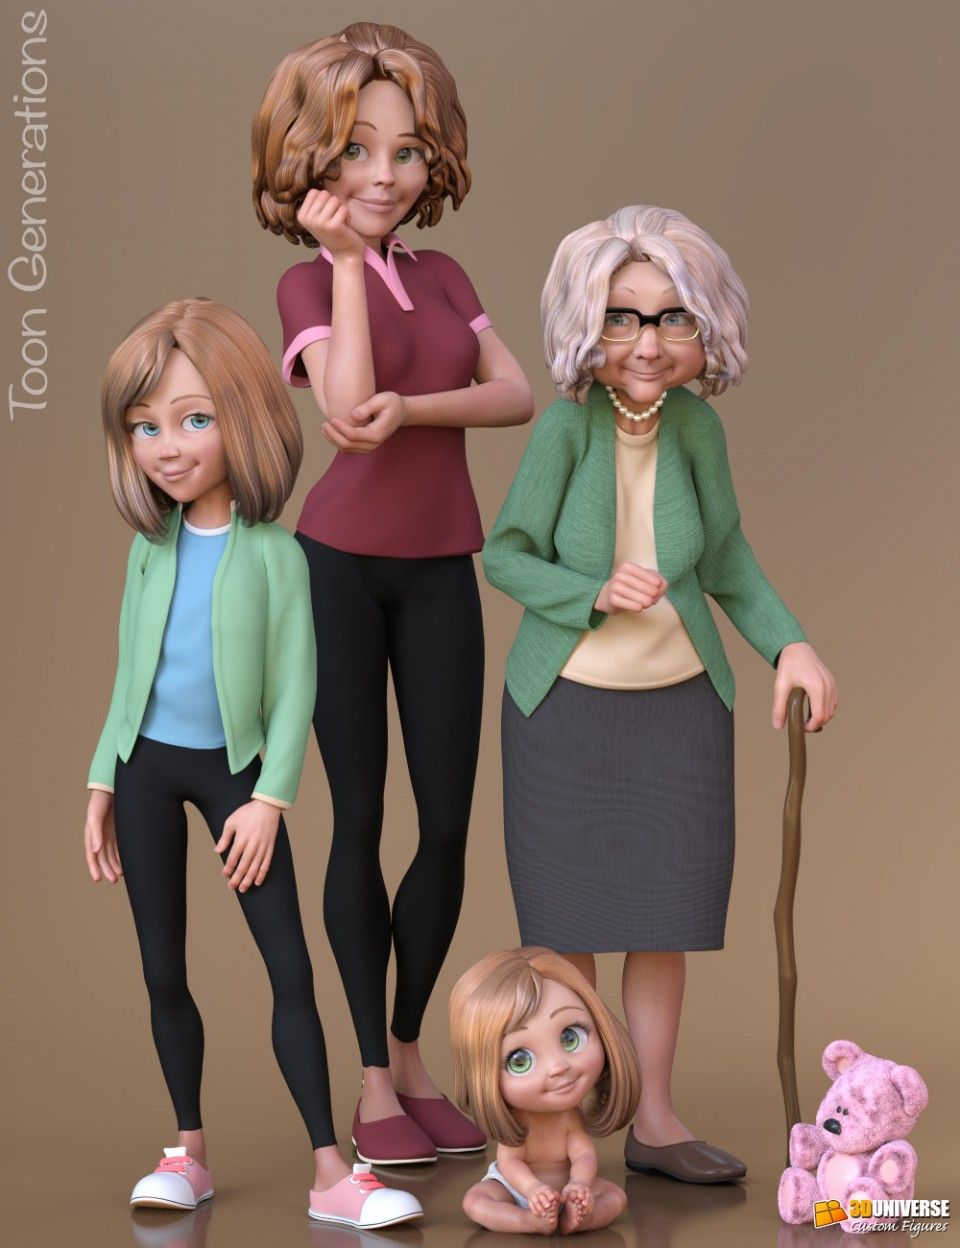 Toon Generations Essentials G8f Female Genesis Generation